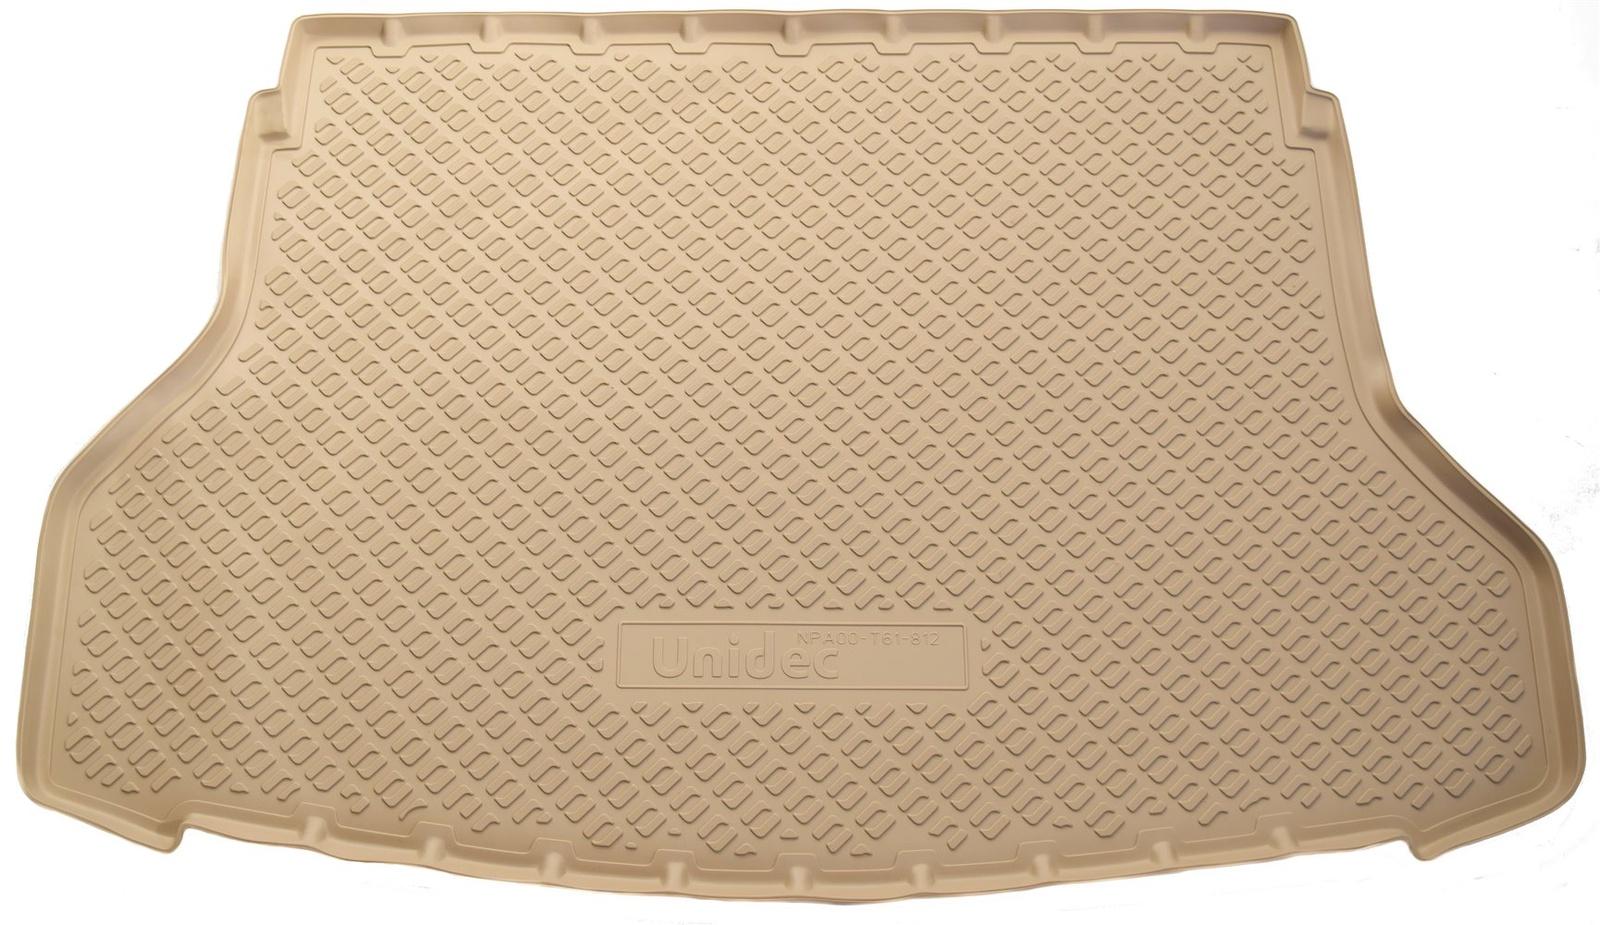 Коврик багажника для subaru outback (wag) (2010) (бежевый) npl-p-84-57-b коврик багажника полиуретан чёрный 2awd norplast npl p 69 04 для renault duster 2011